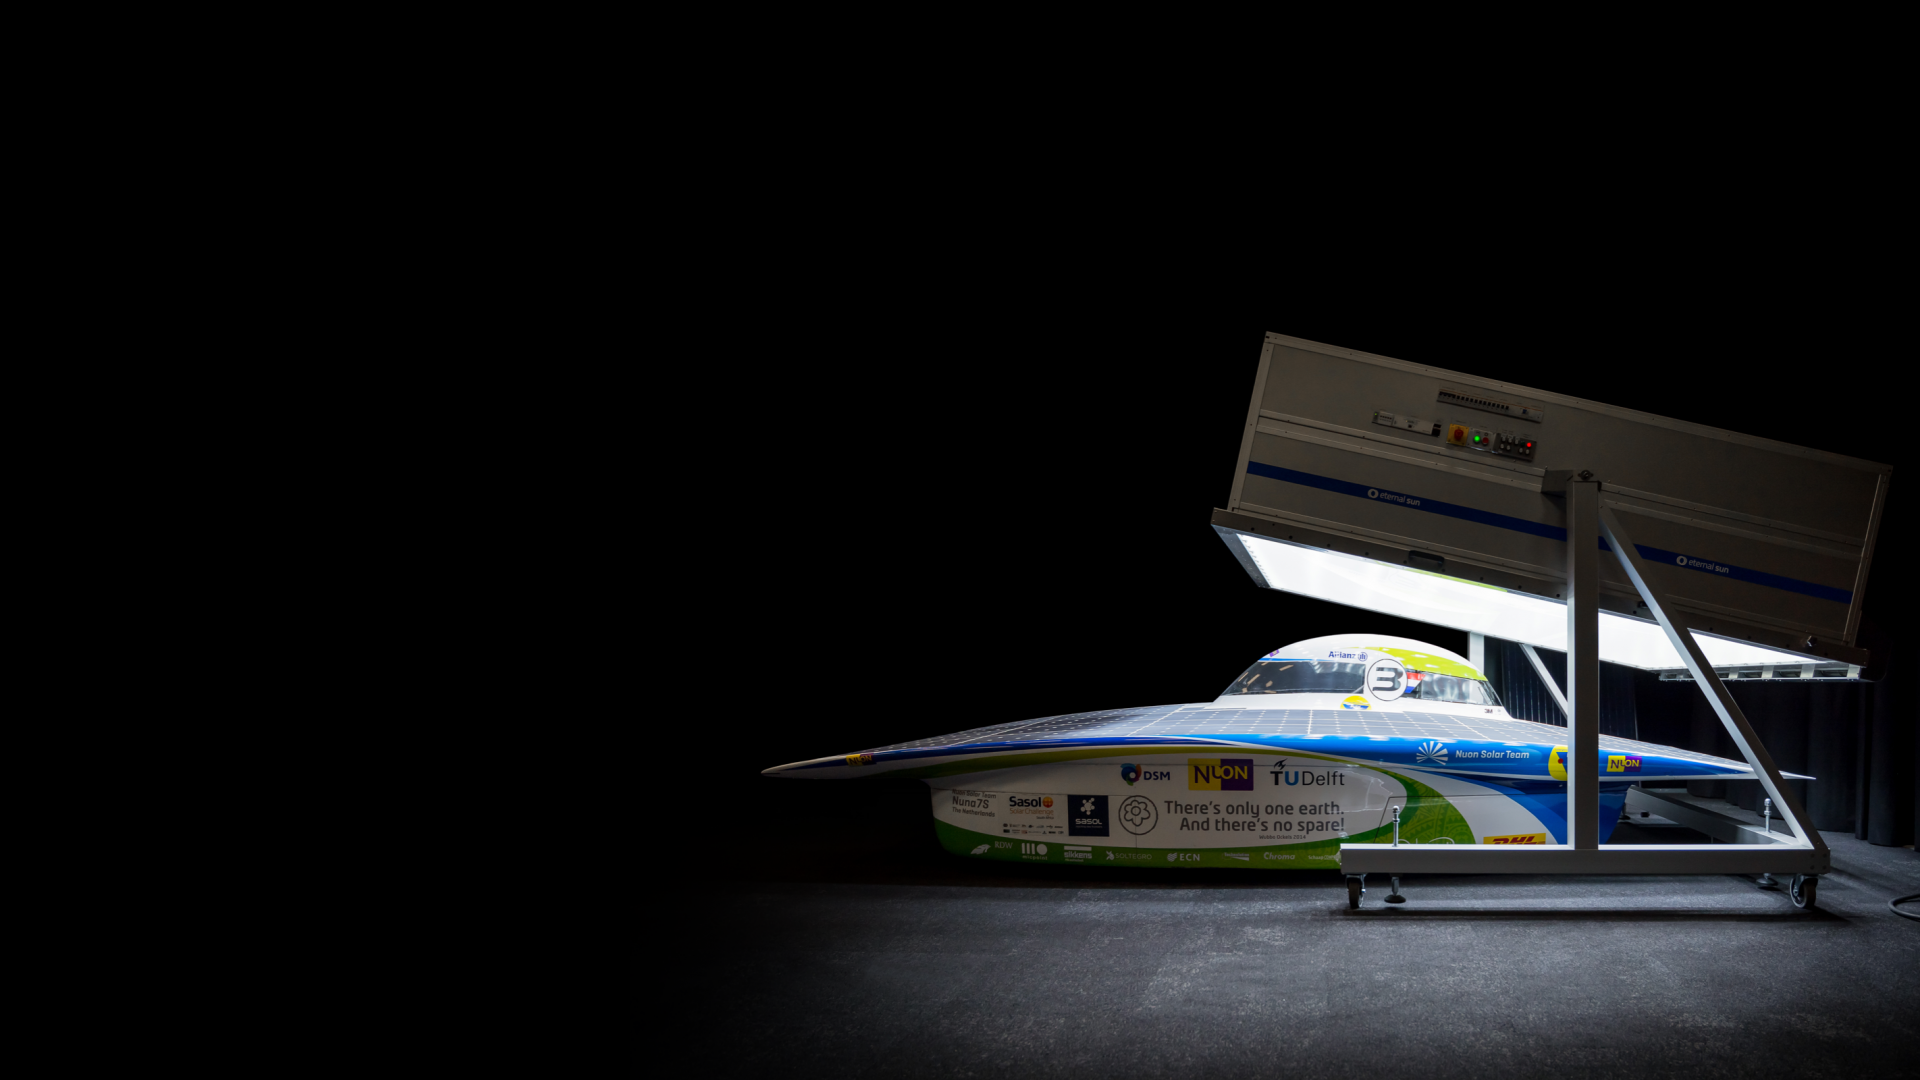 Solar PV car lightsoaking under a steady state solar simulator